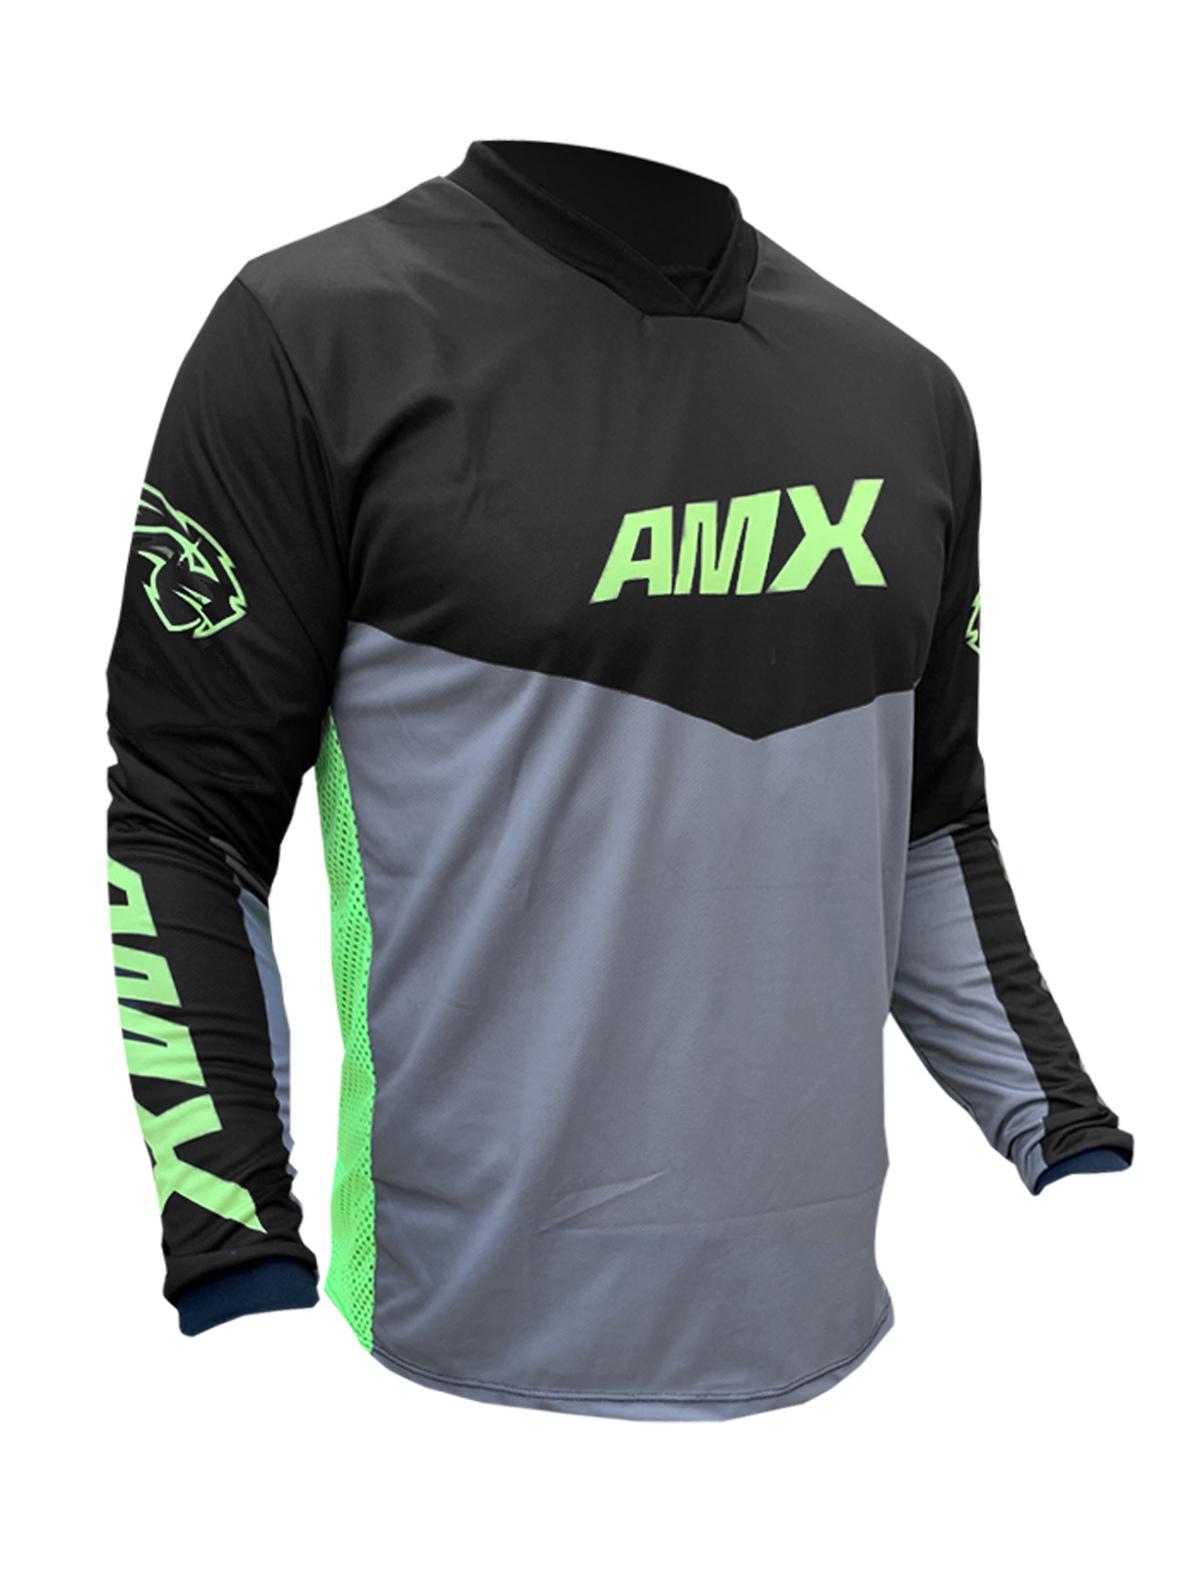 Camisa Amx Prime Cross Preto Neon Trilha Motocross